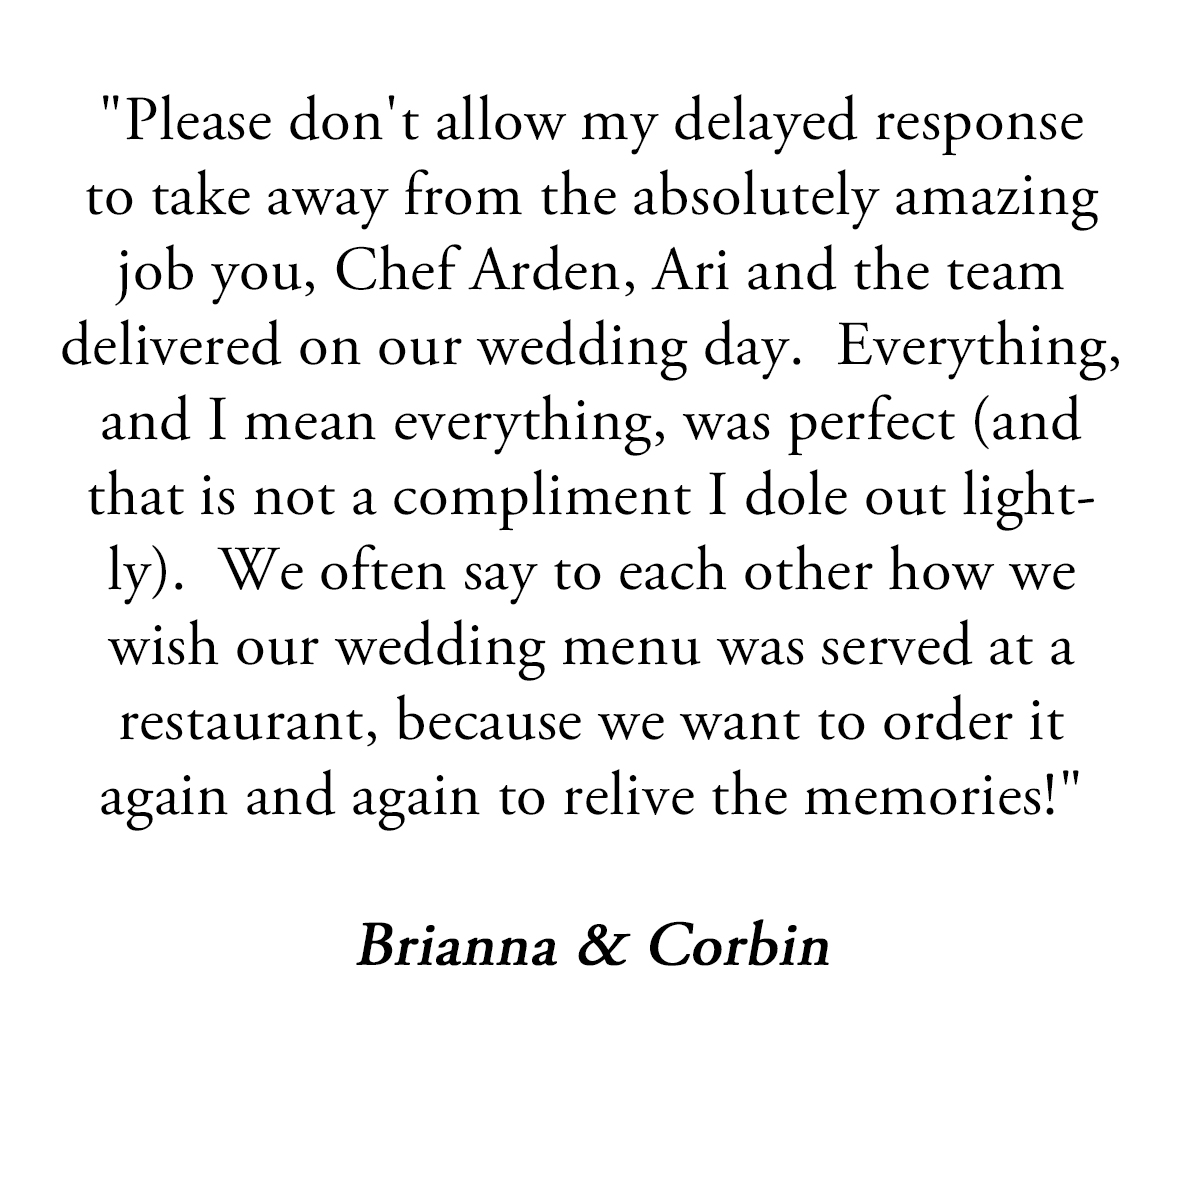 Brianna and corbin.jpg